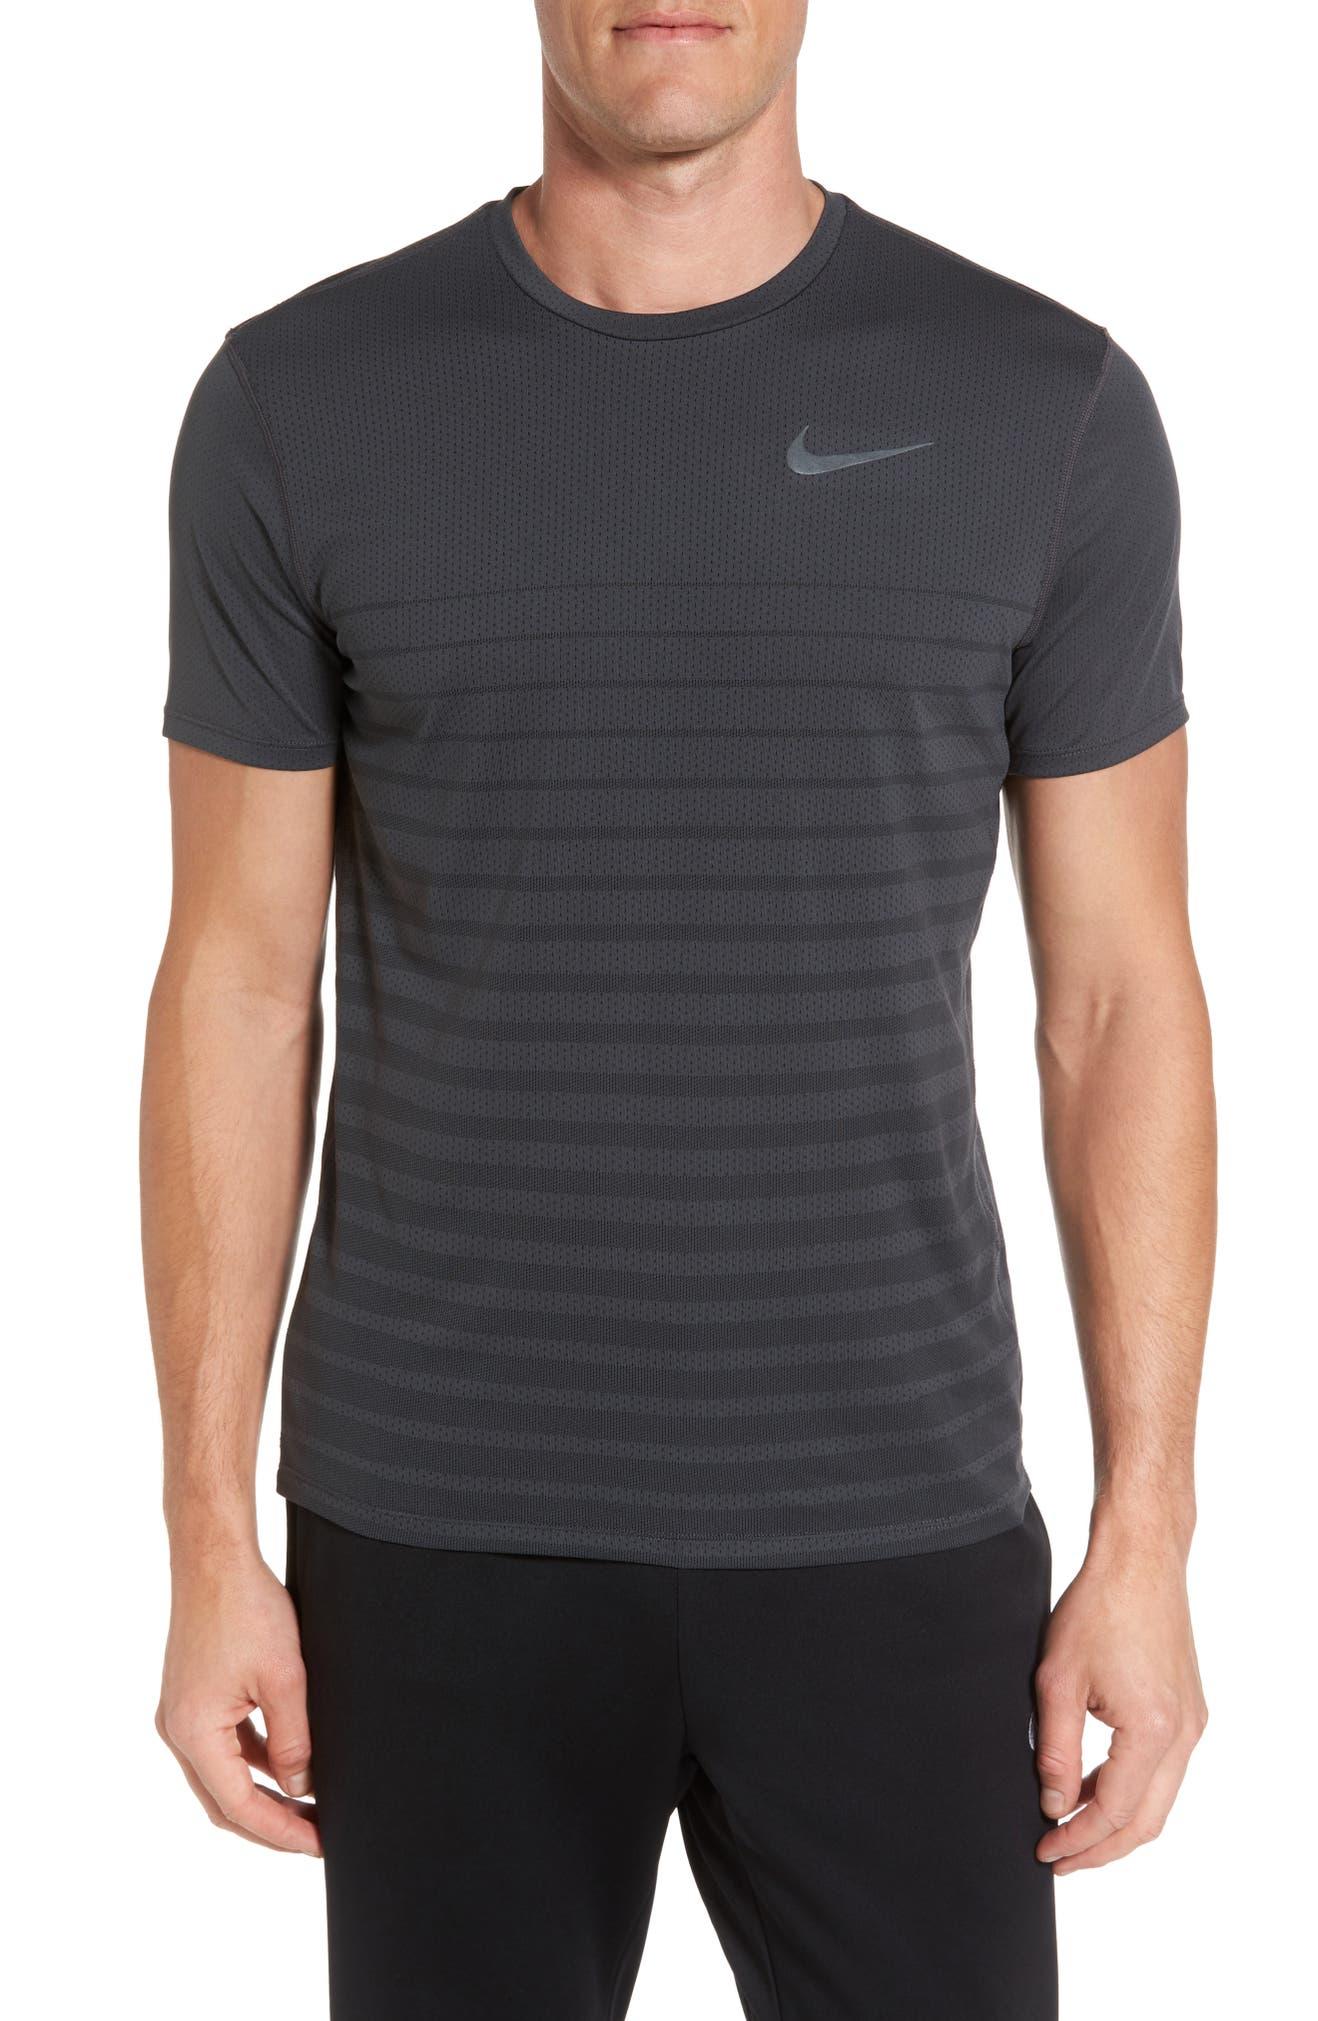 225342329 Nike Keep Running T Shirt - DREAMWORKS